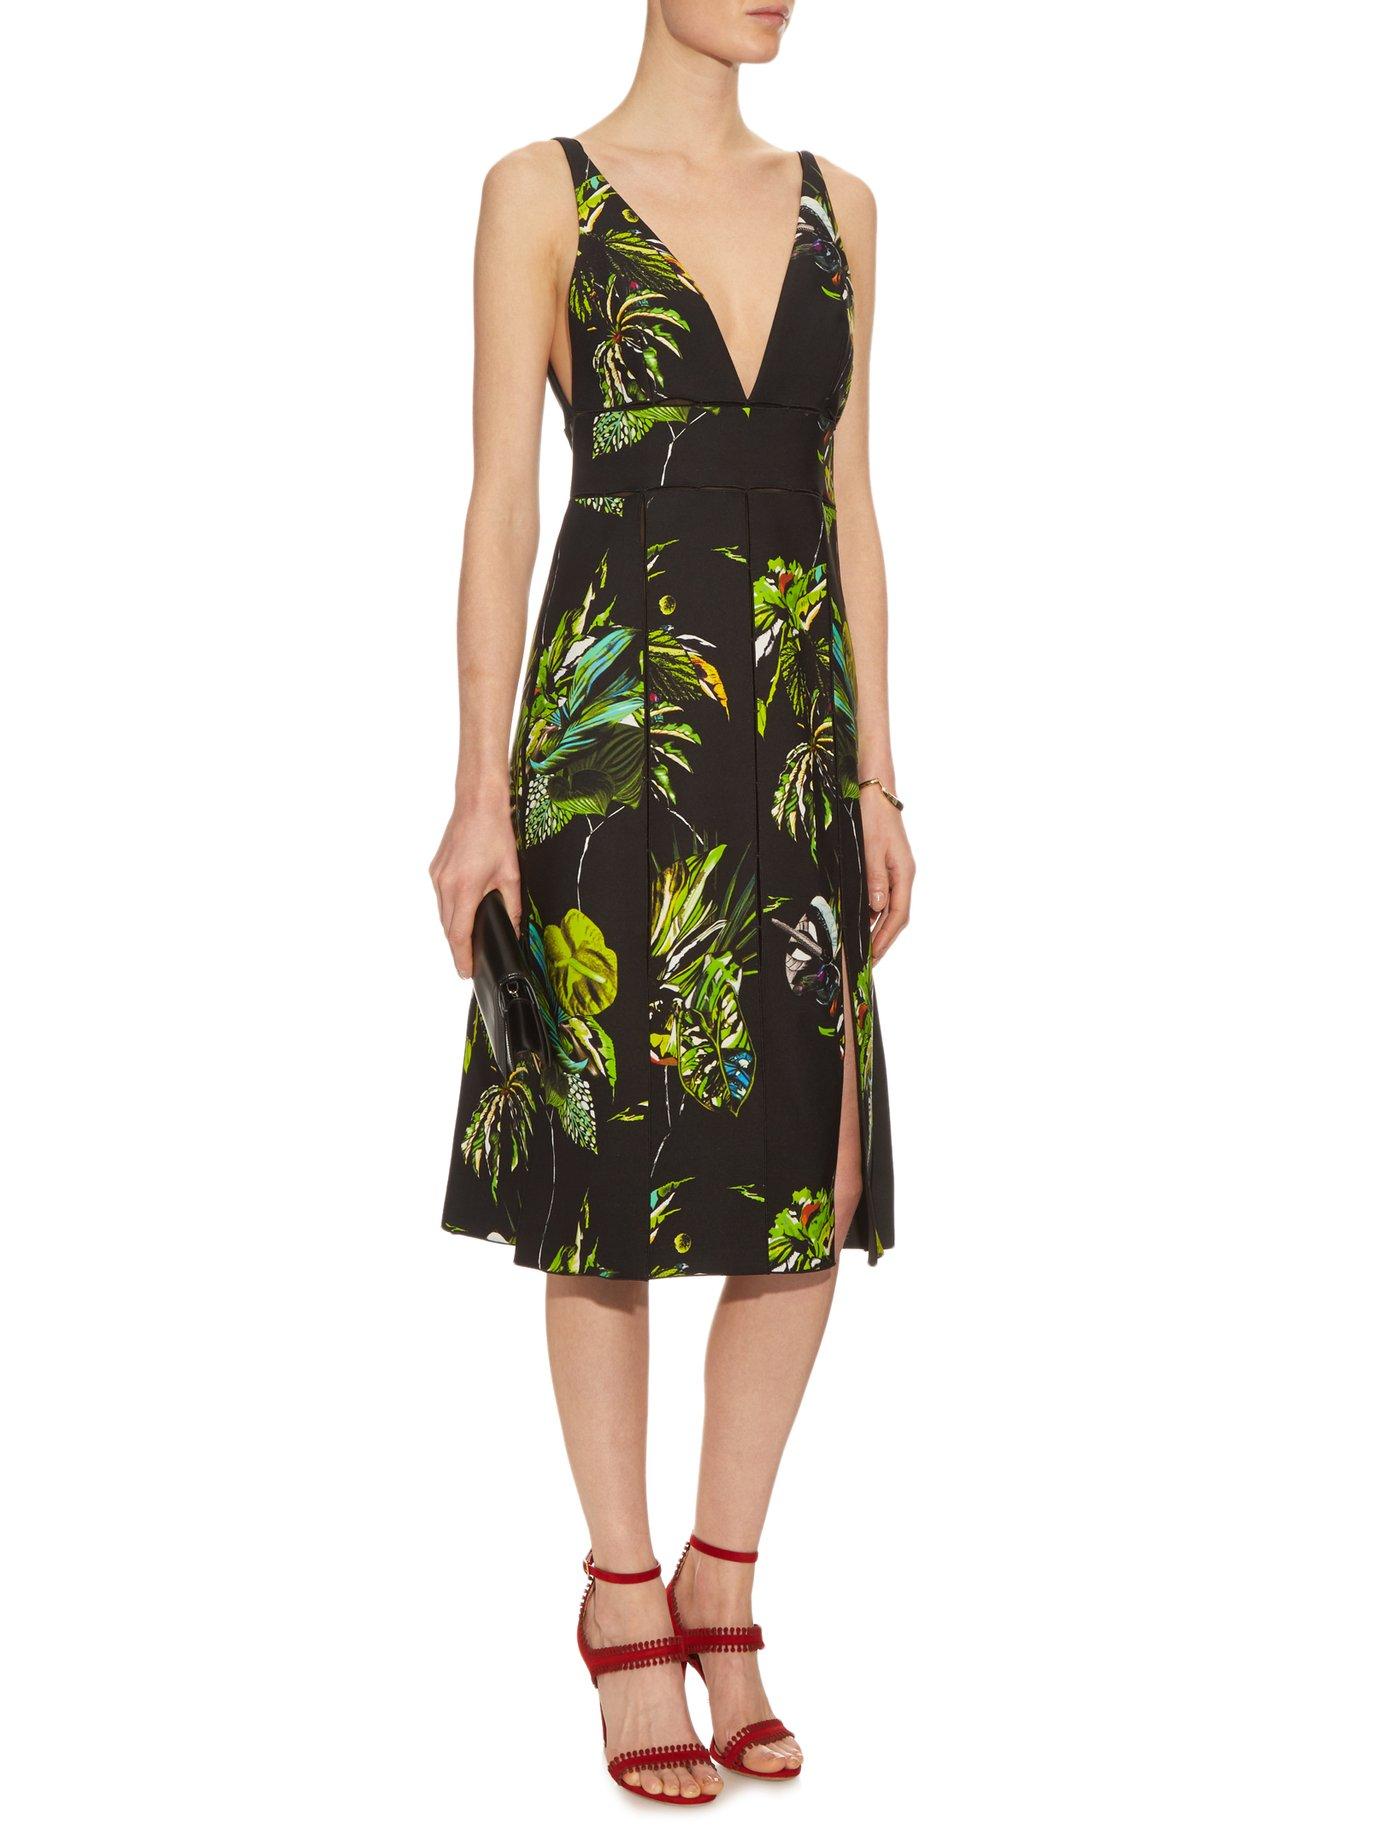 Tropical-print cut-out dress by Proenza Schouler